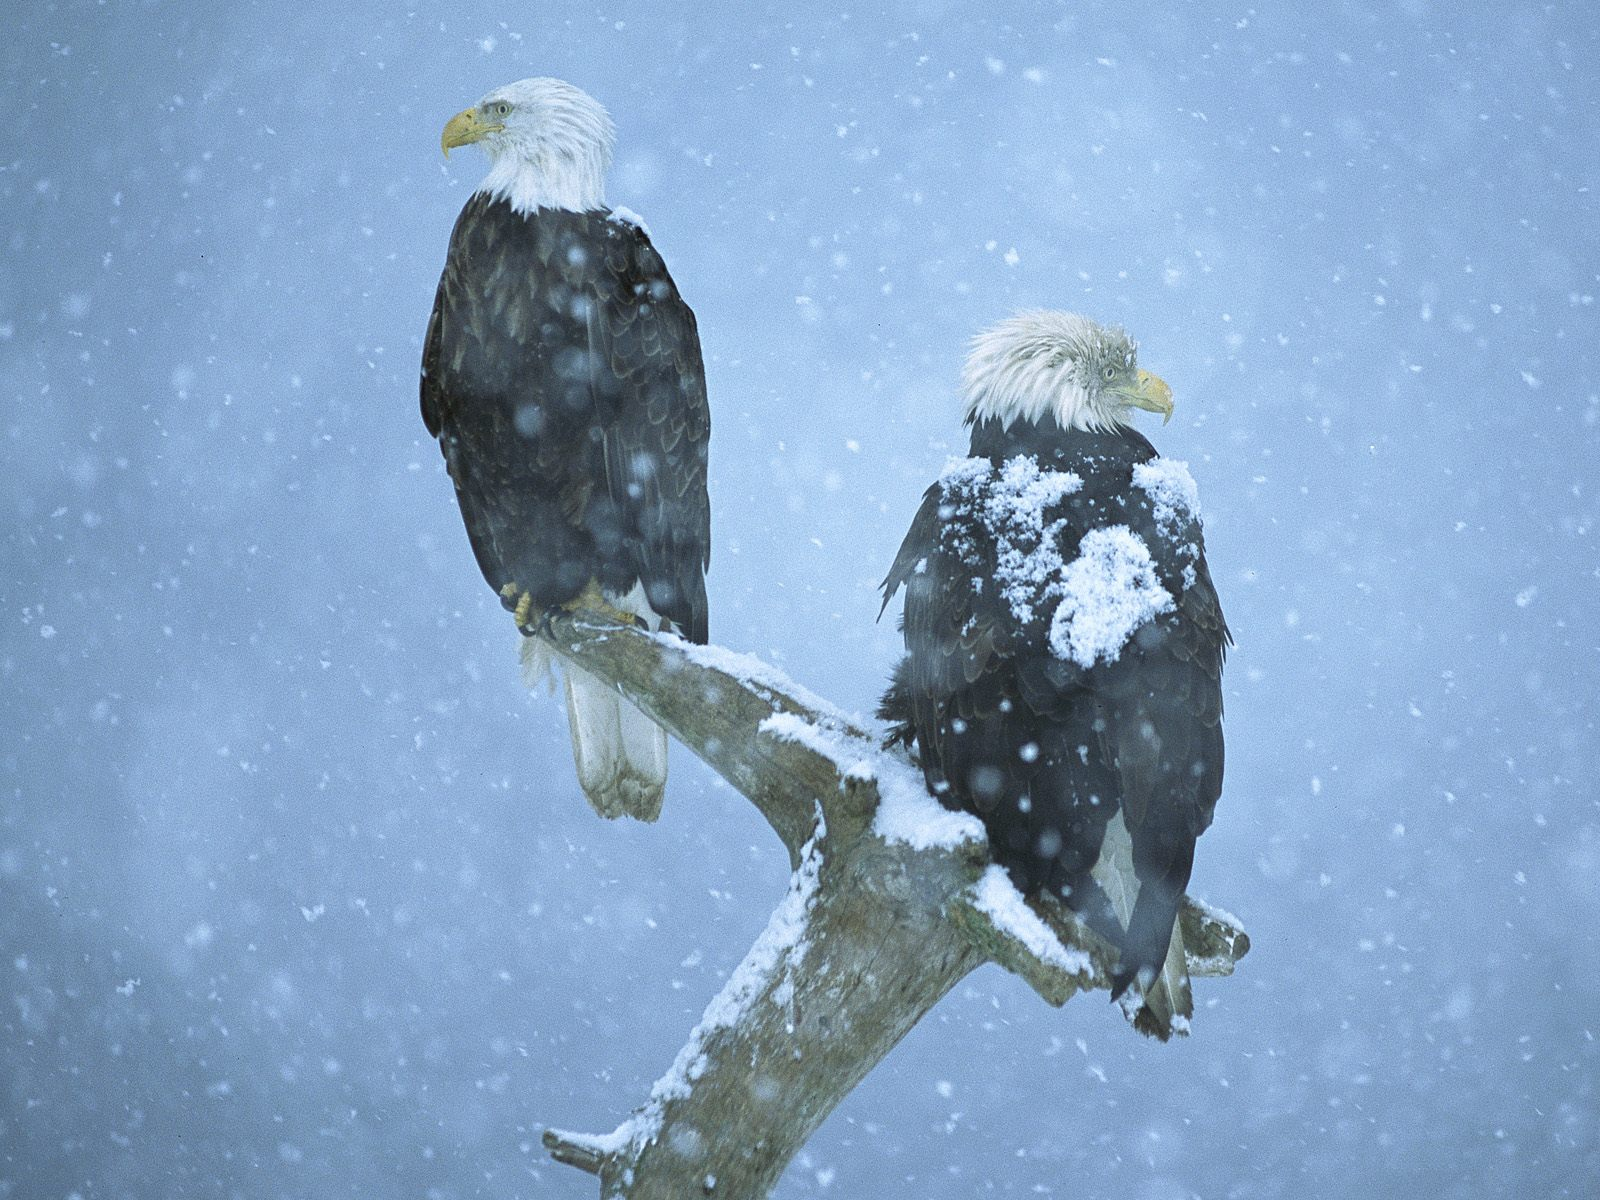 Bald Eagle HD Wallpapers 2012 1600x1200